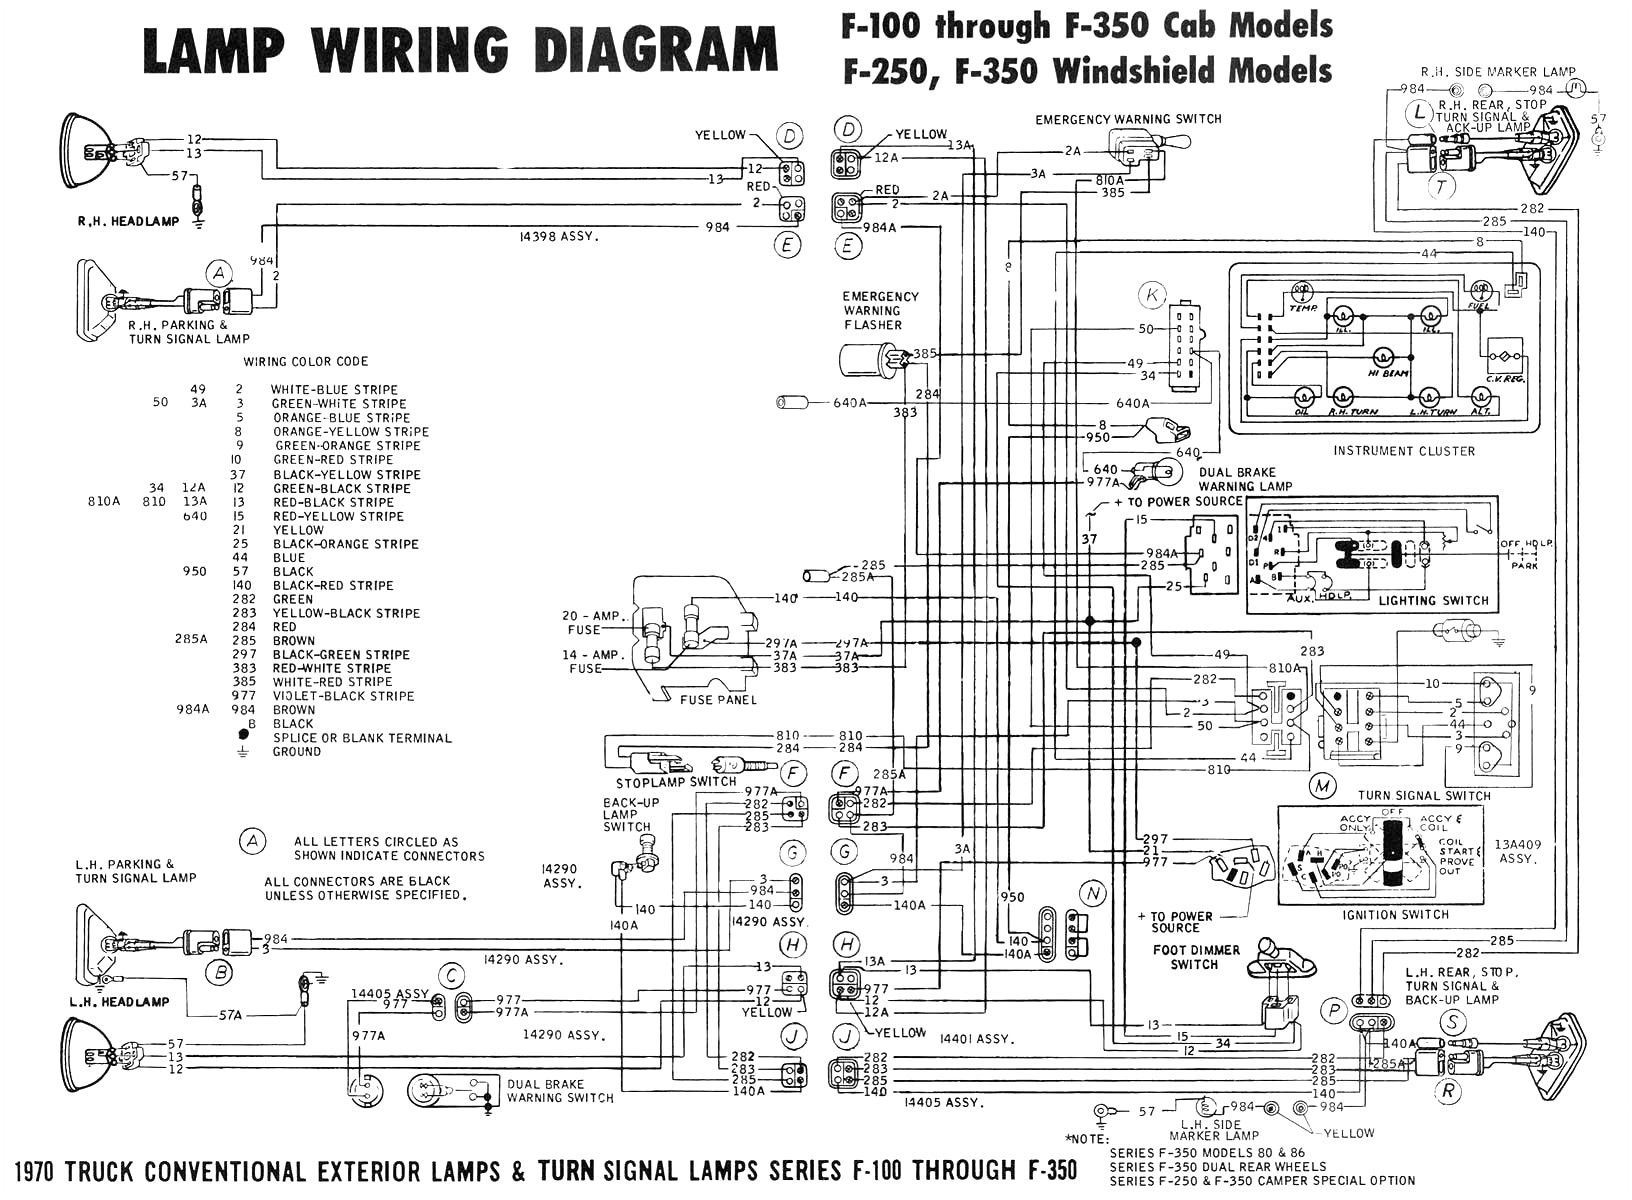 2006 e250 wiring diagram wiring diagram for you 2006 ford e250 radio wiring diagram 2006 ford e250 wiring diagram